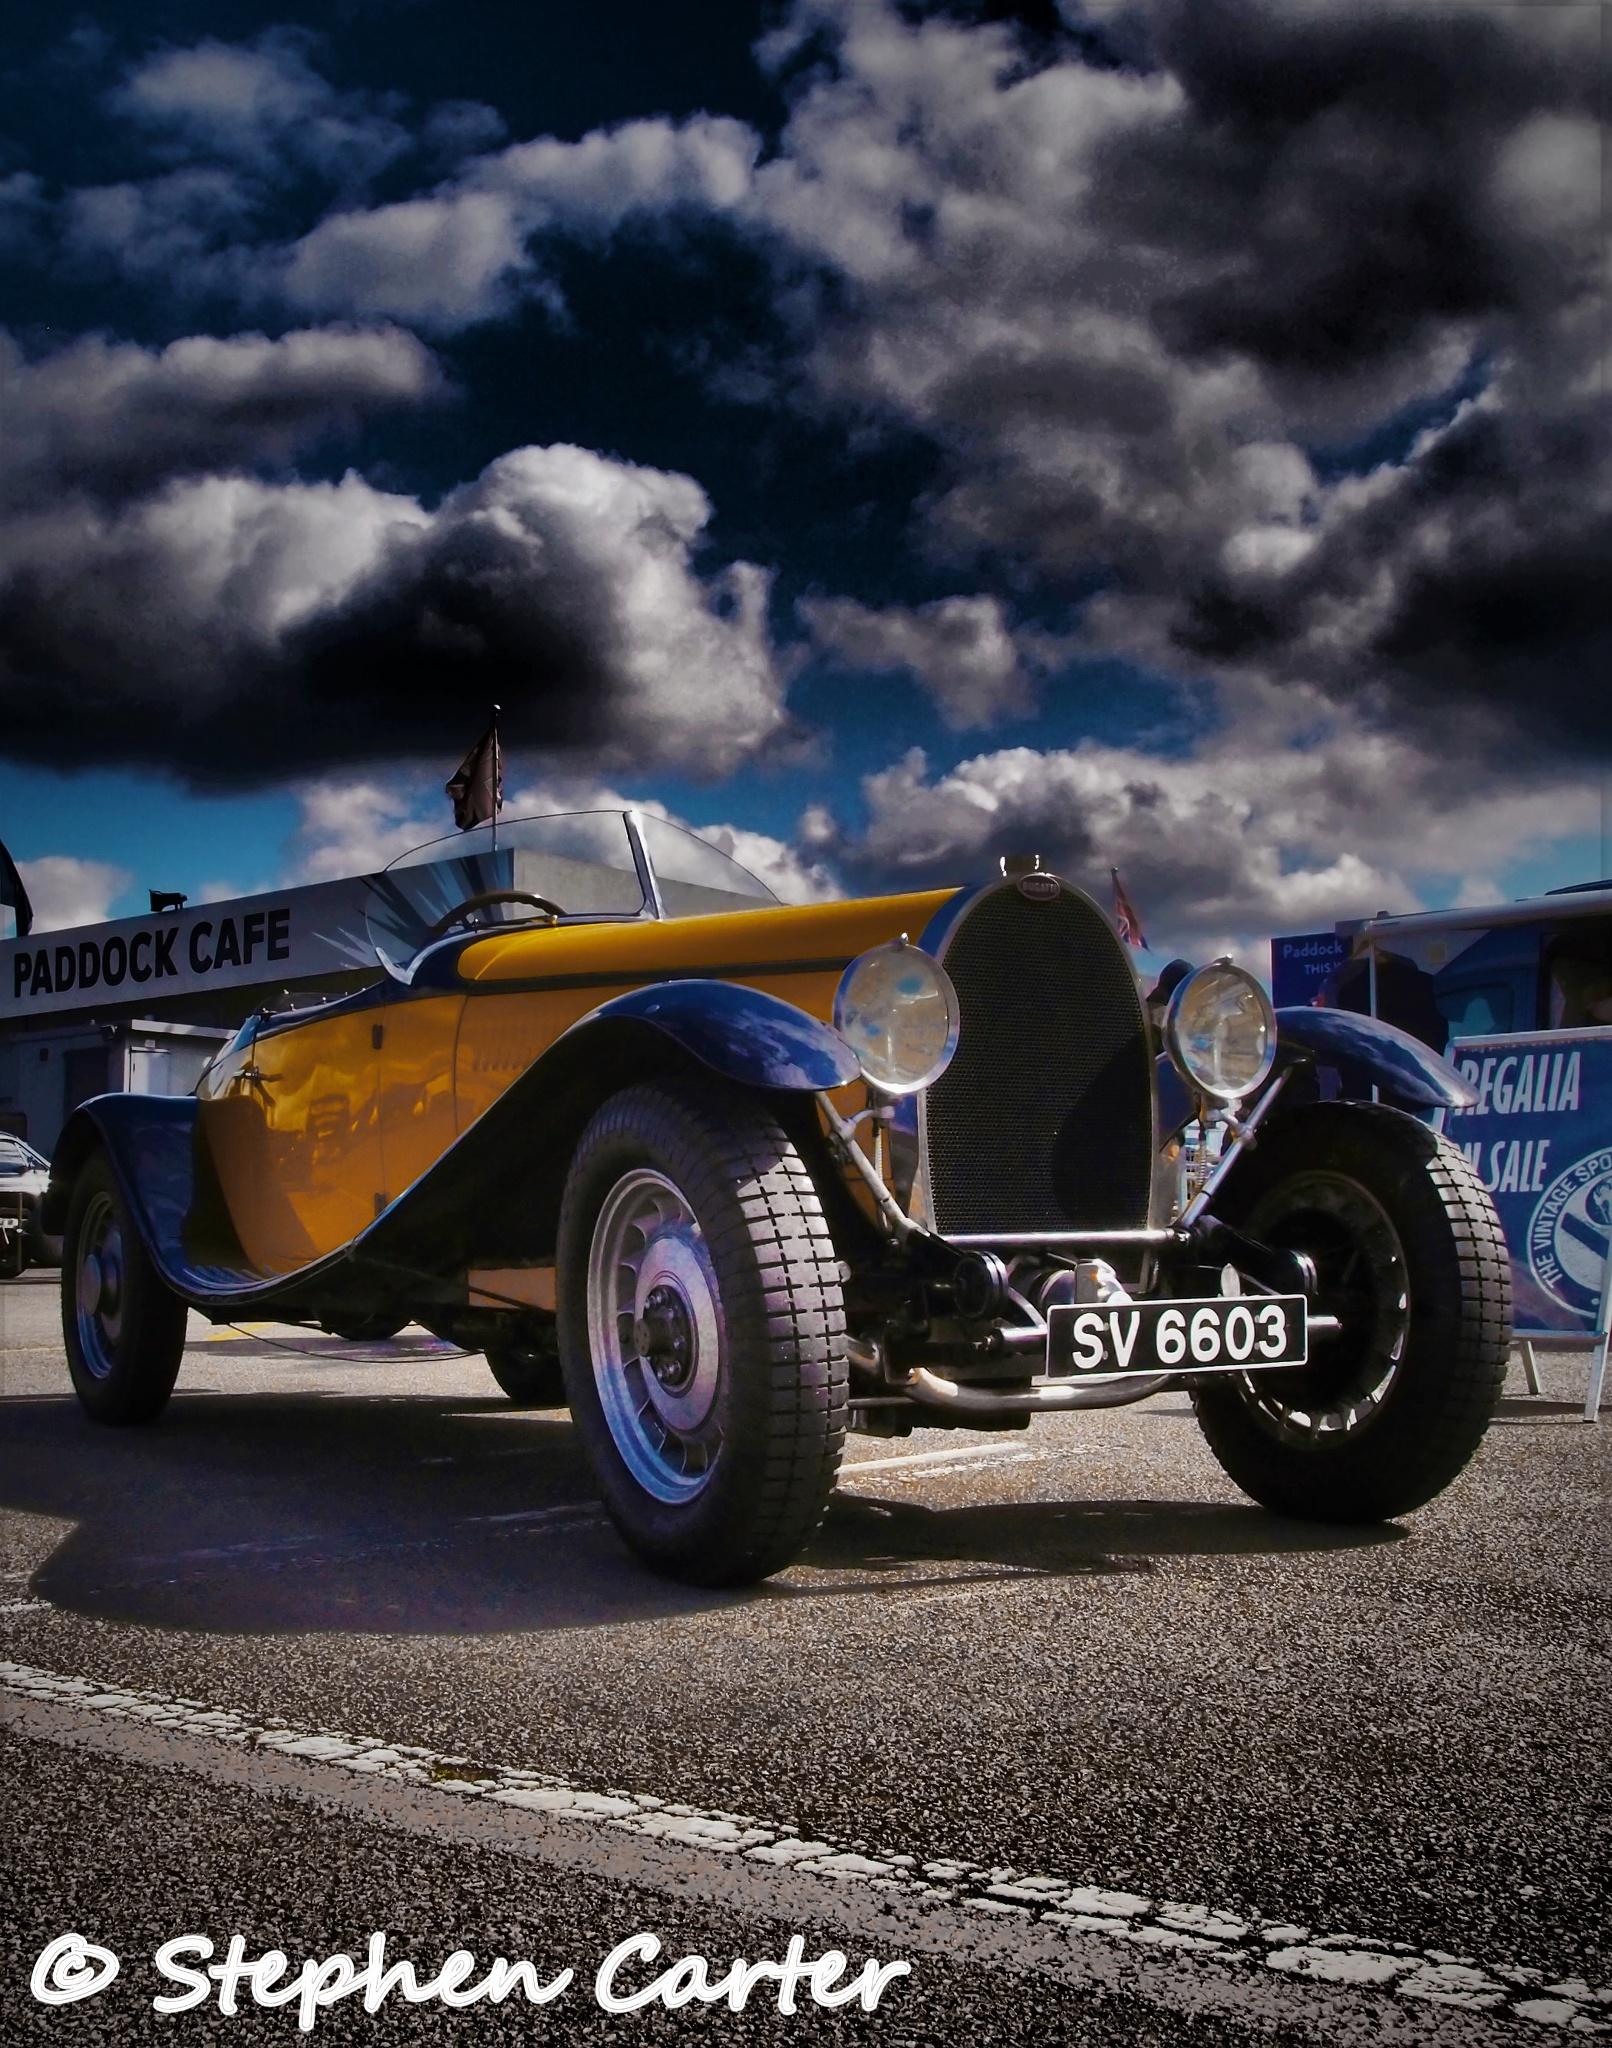 Bugatti SV 6603 by Stephen Carter Photography